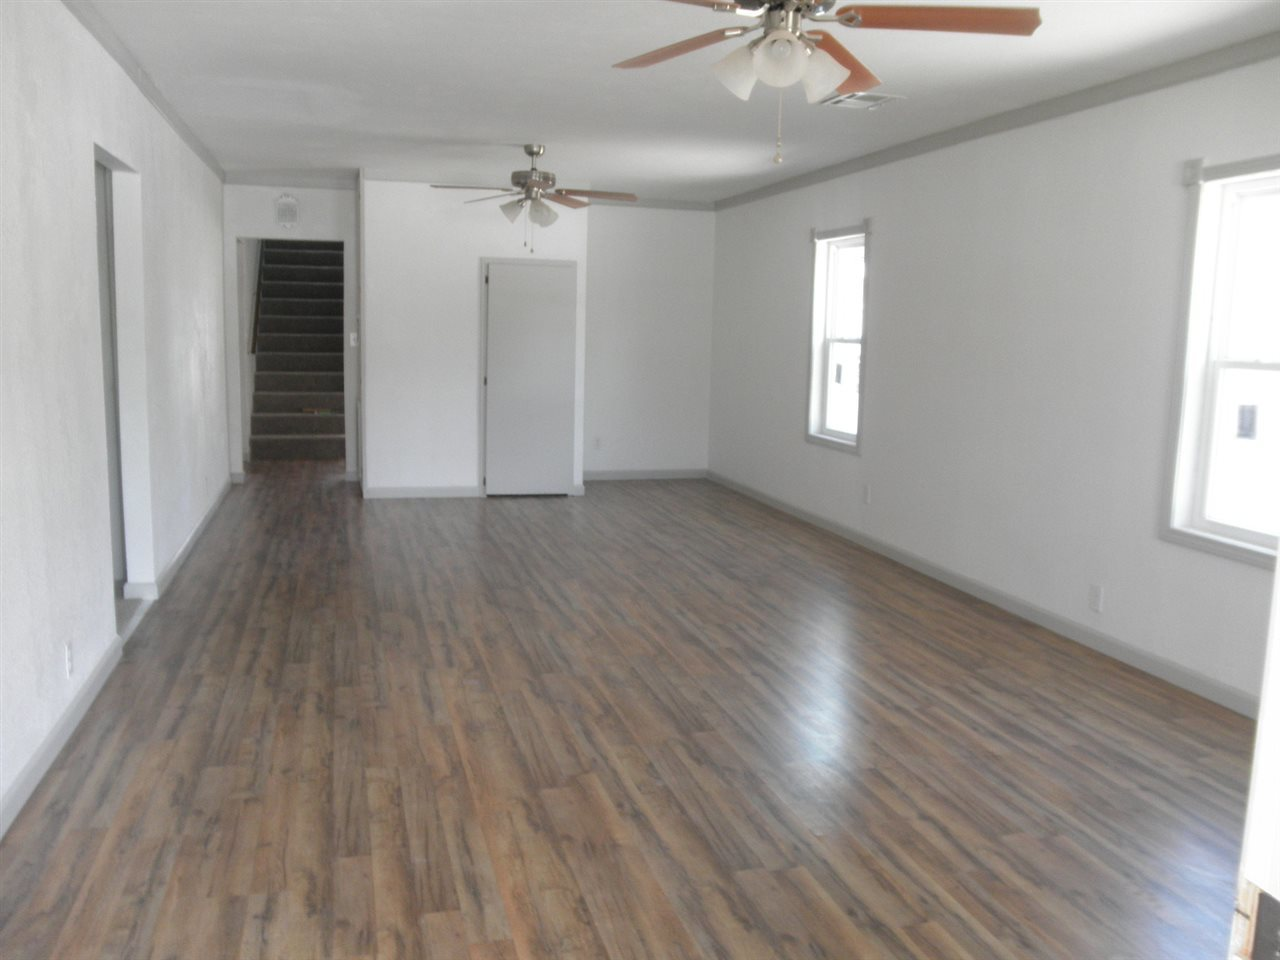 Sold Cross Sale W/ MLS | 189 Tapp Road  Ponca City, OK 74604 2